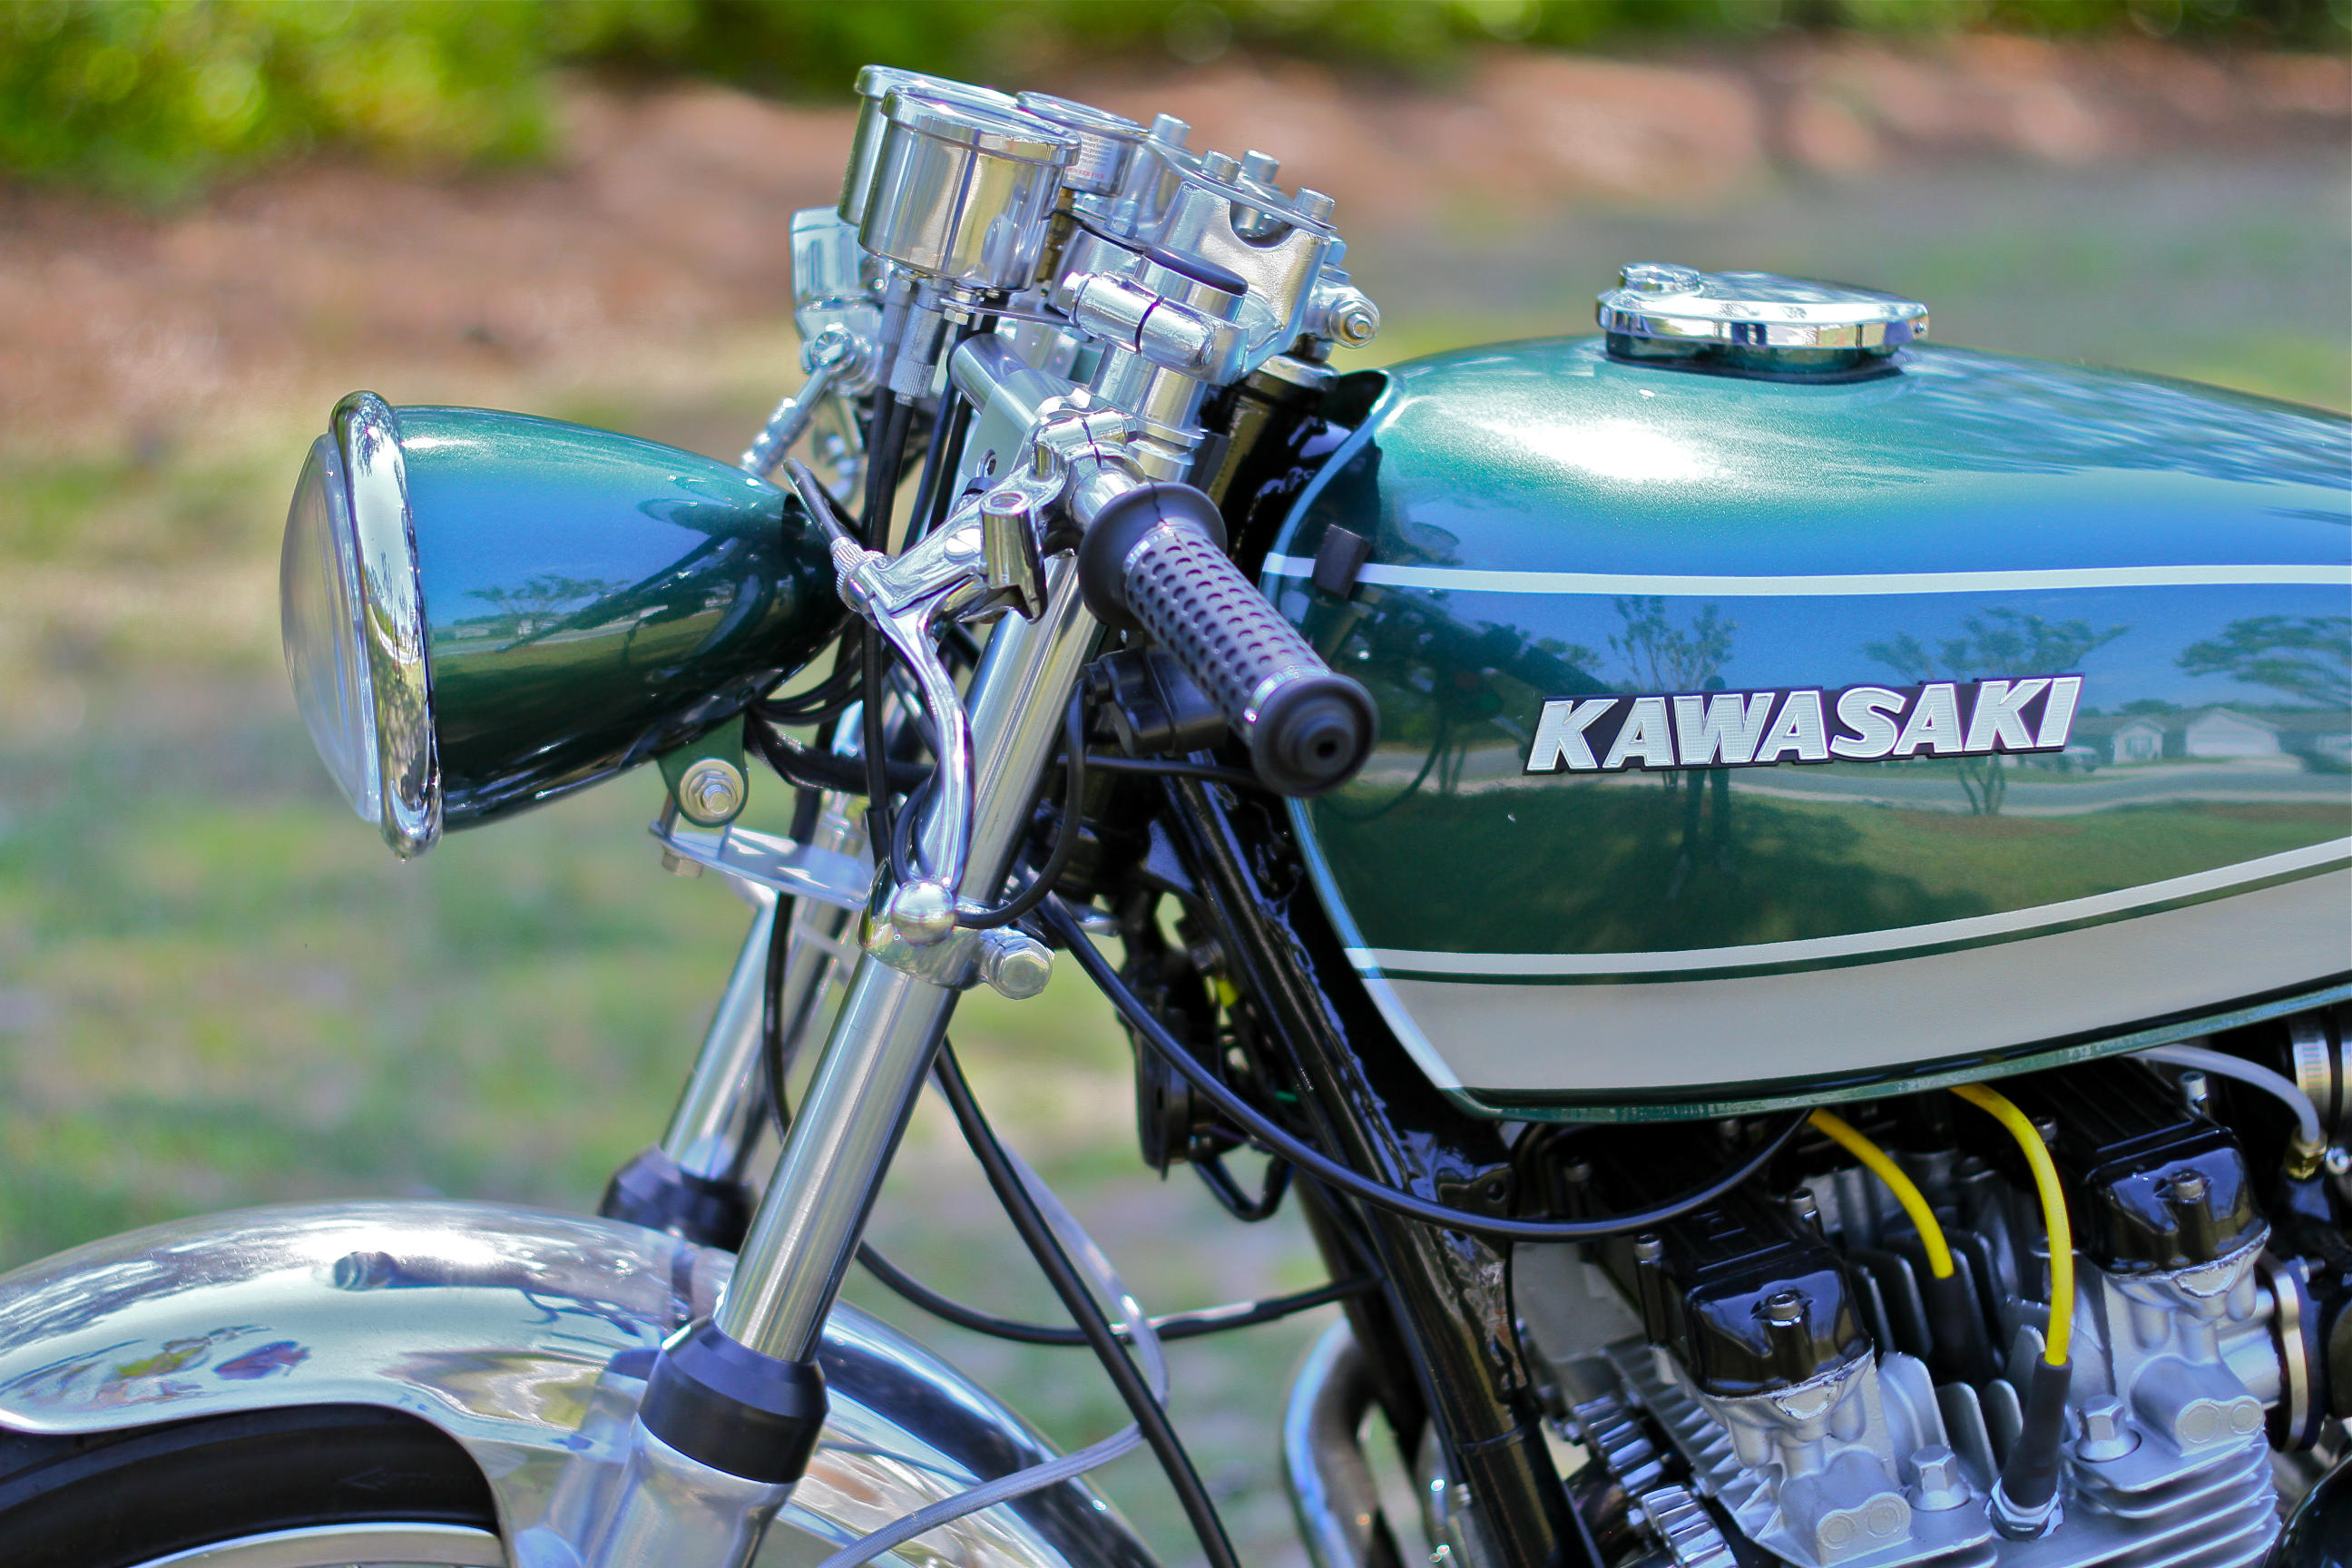 Kawasaki KZ650 Turbo